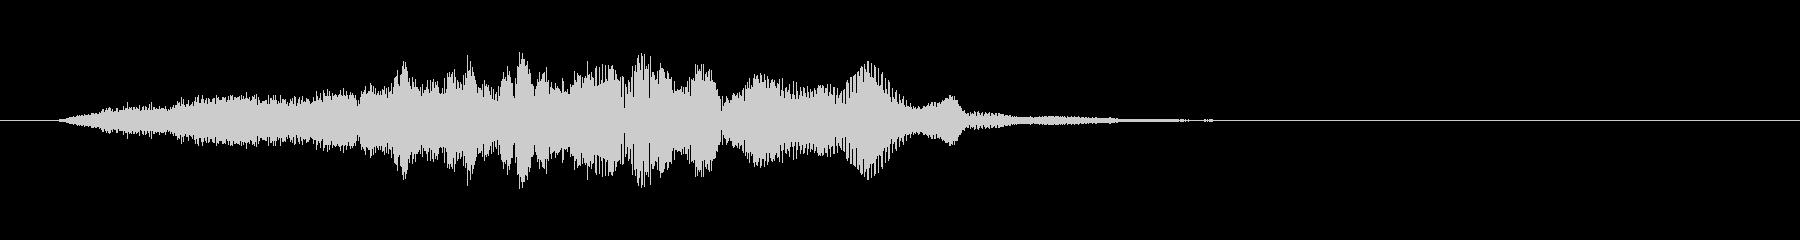 Sci Fiスイープダウン-スペー...の未再生の波形